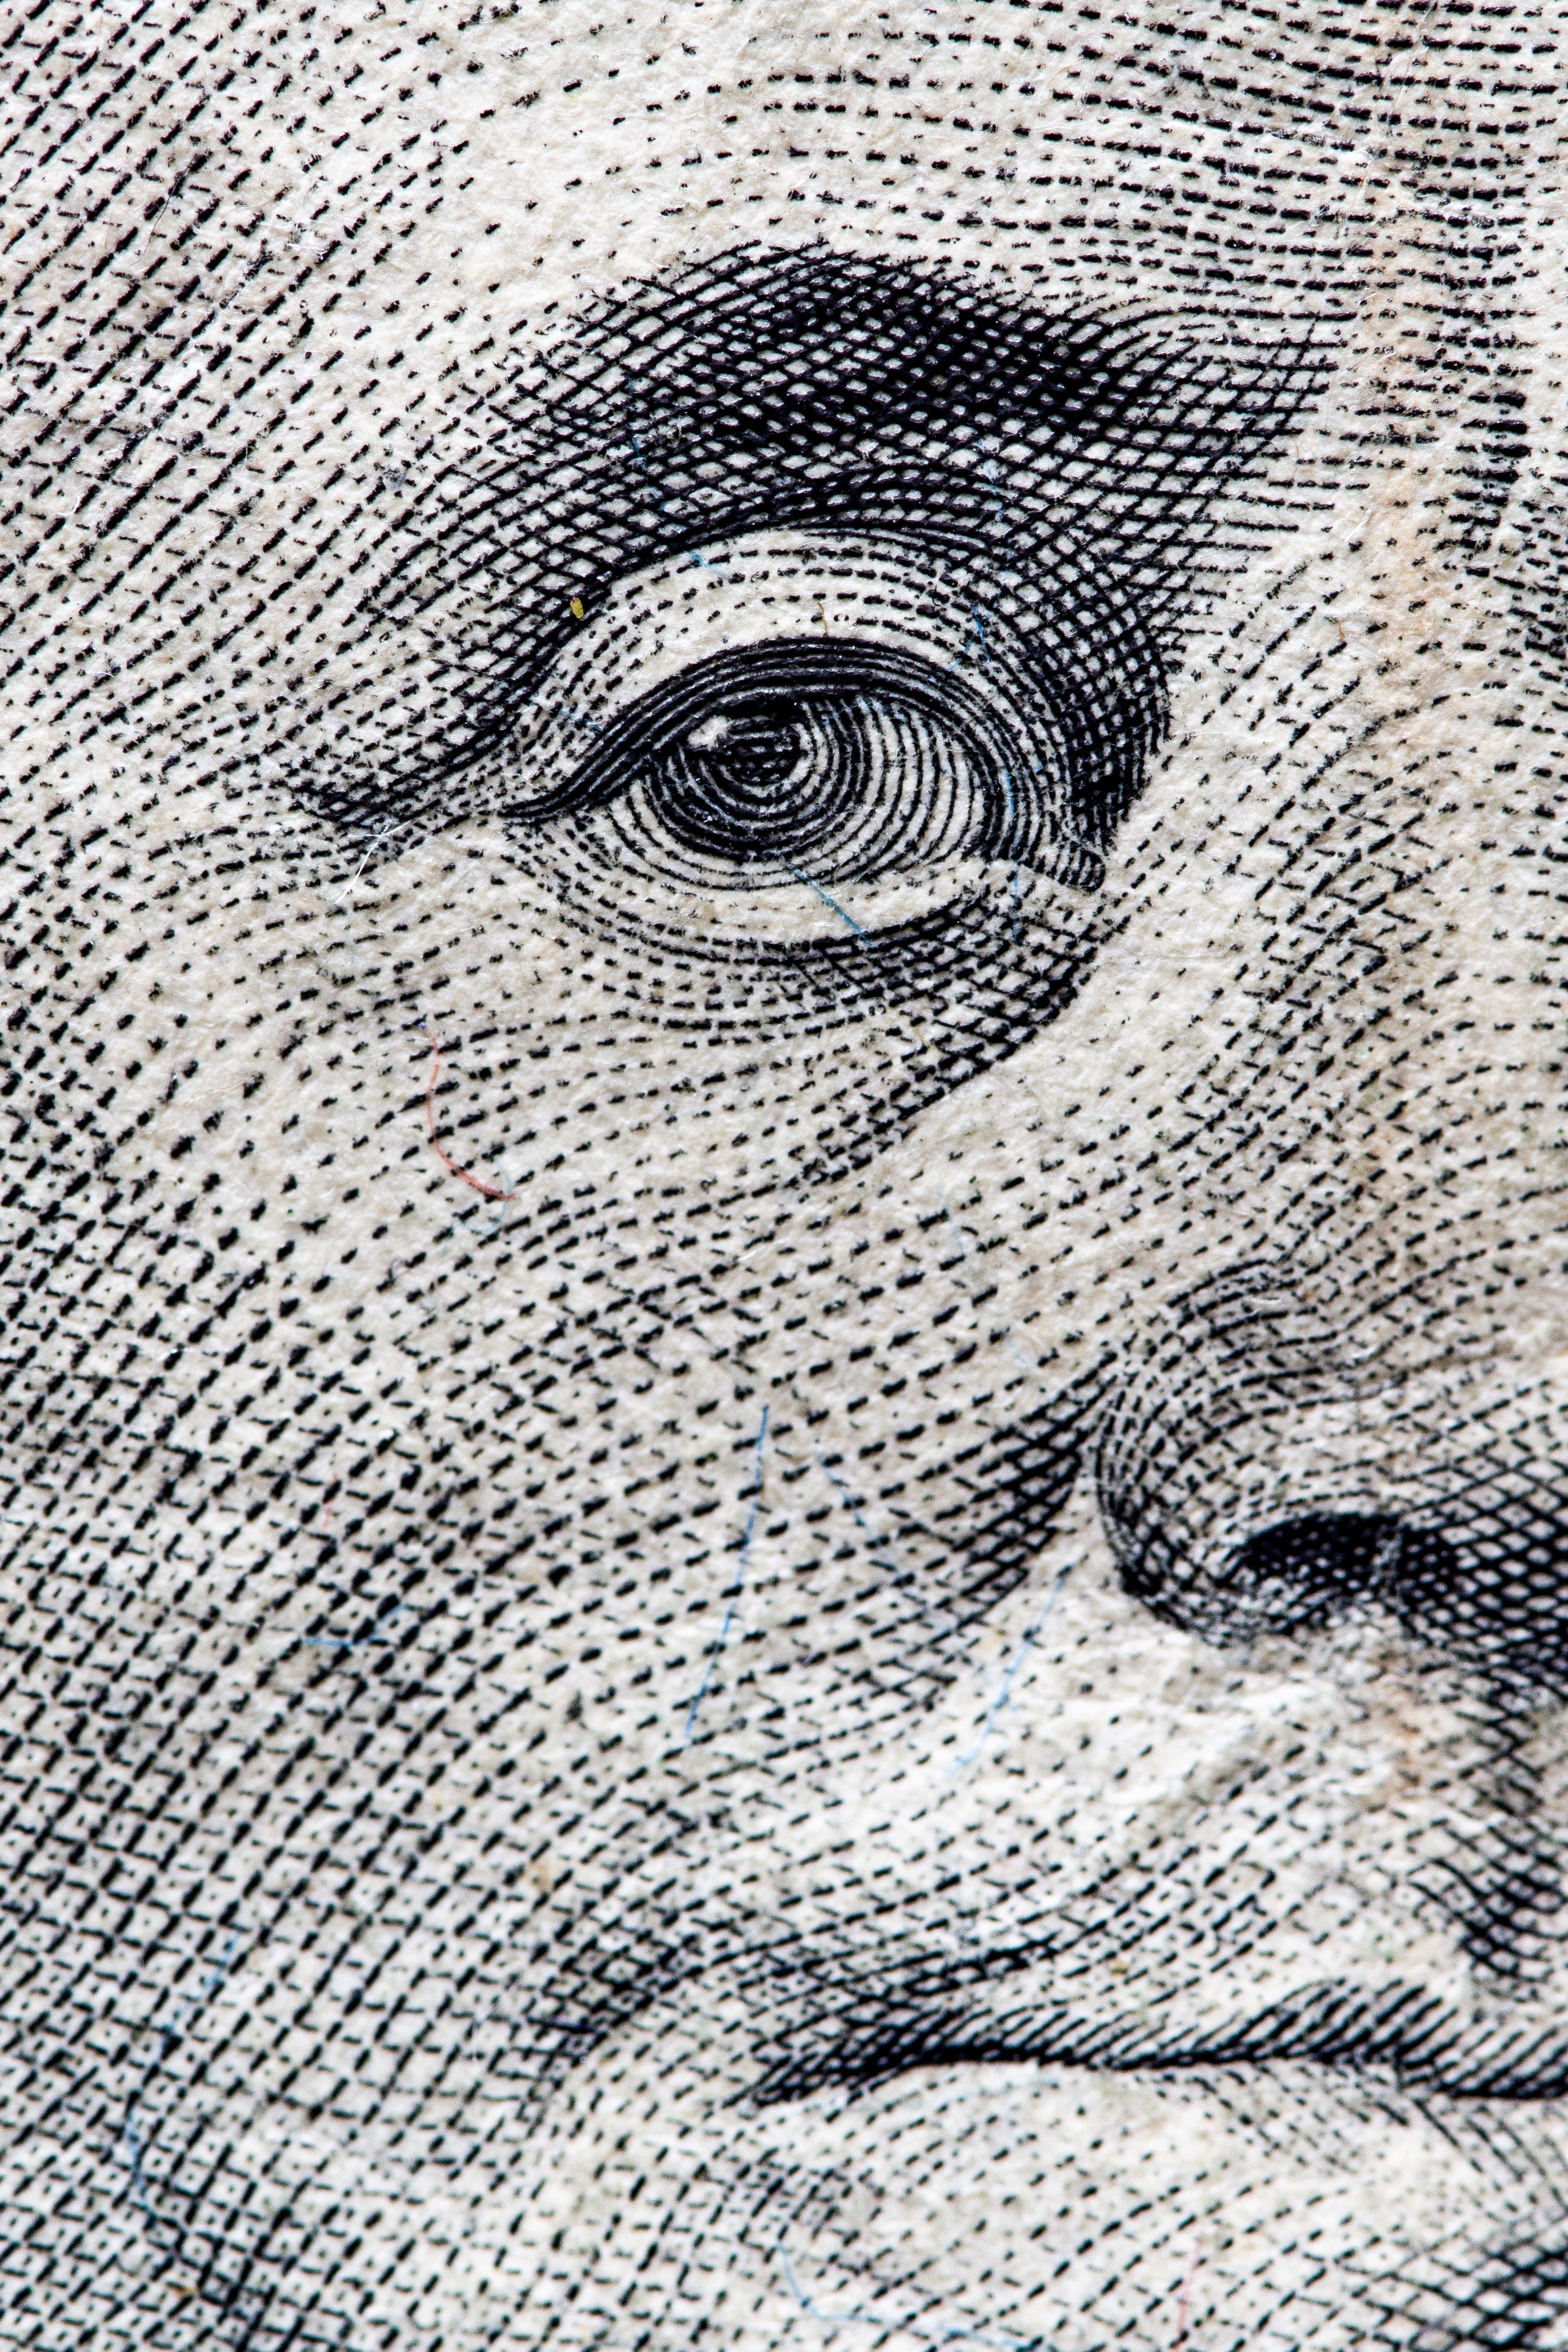 Close-up of George Washington's eye on the U.S. one dollar bill